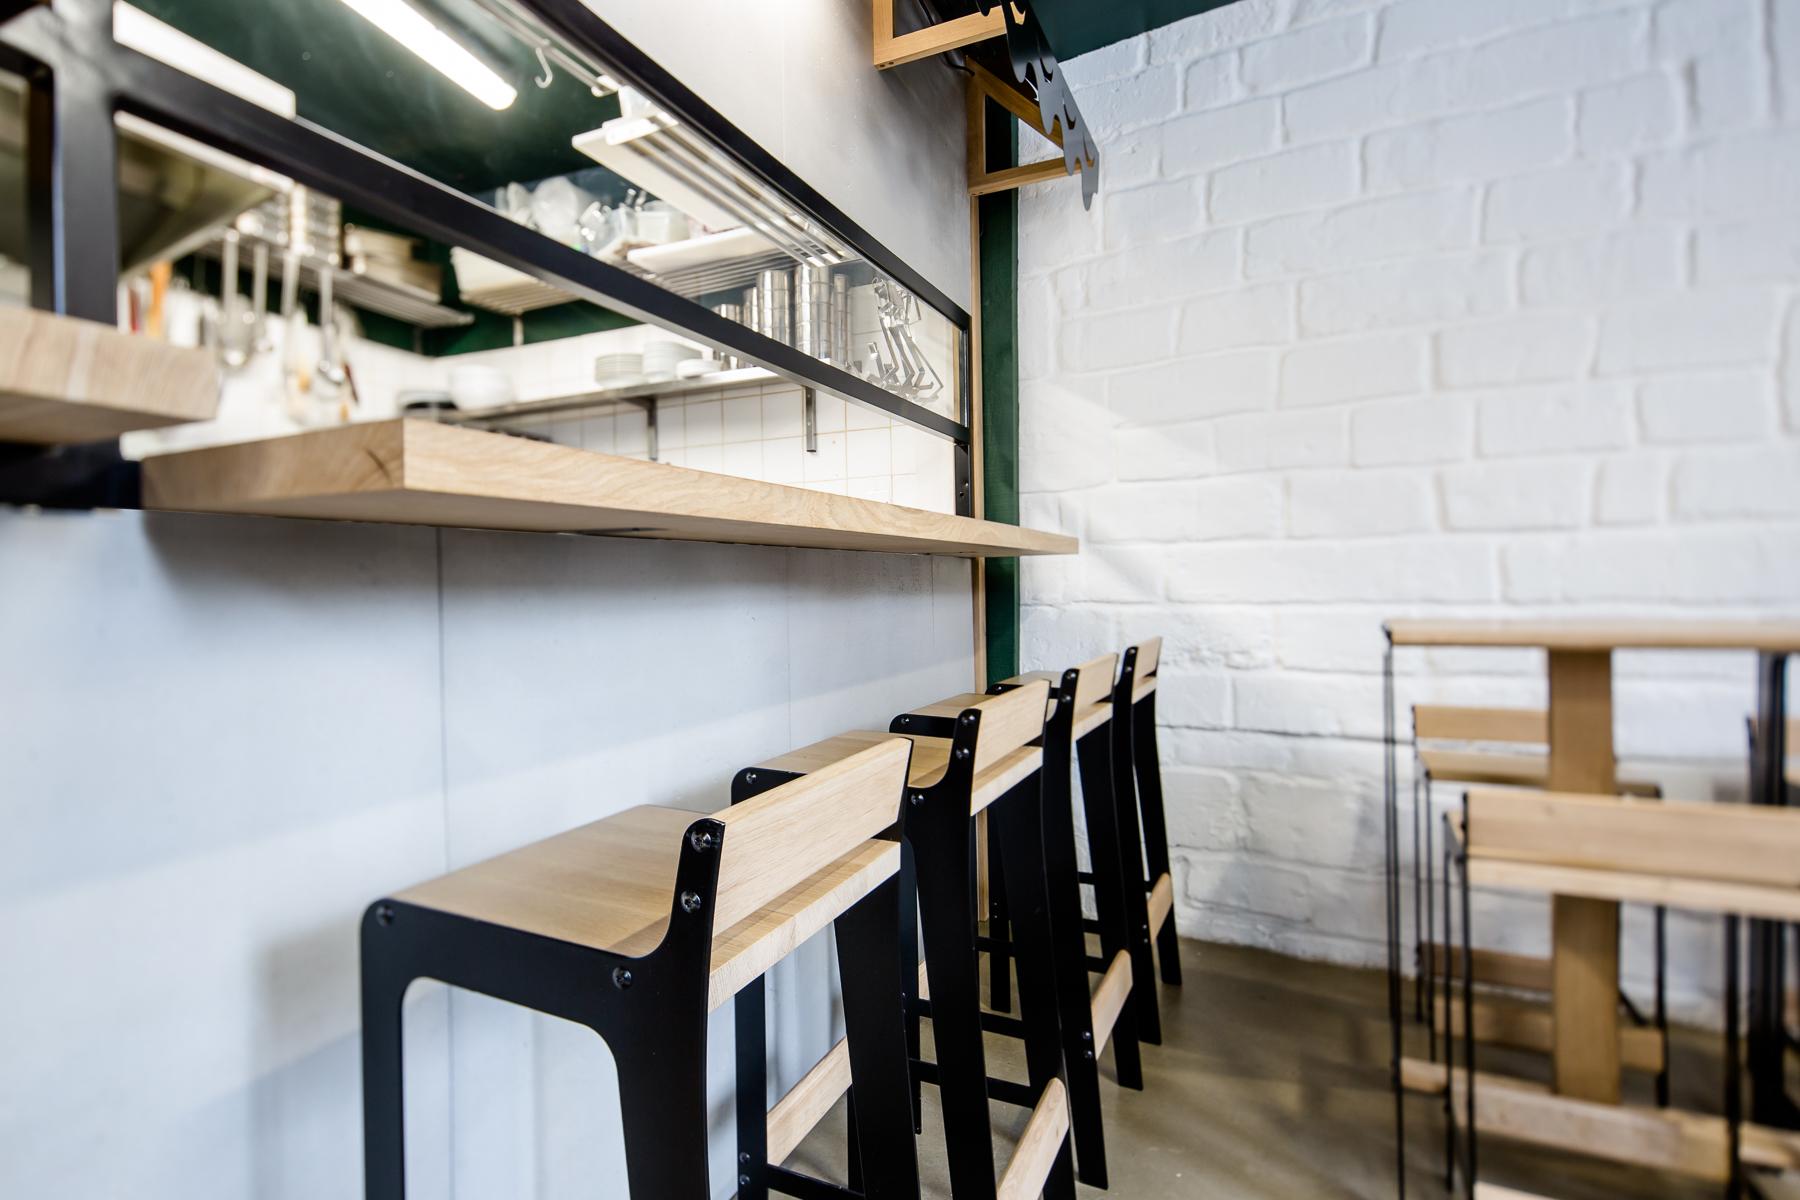 comptoir passe plat Detail design tabouret haut Restaurant Hutong Dircks